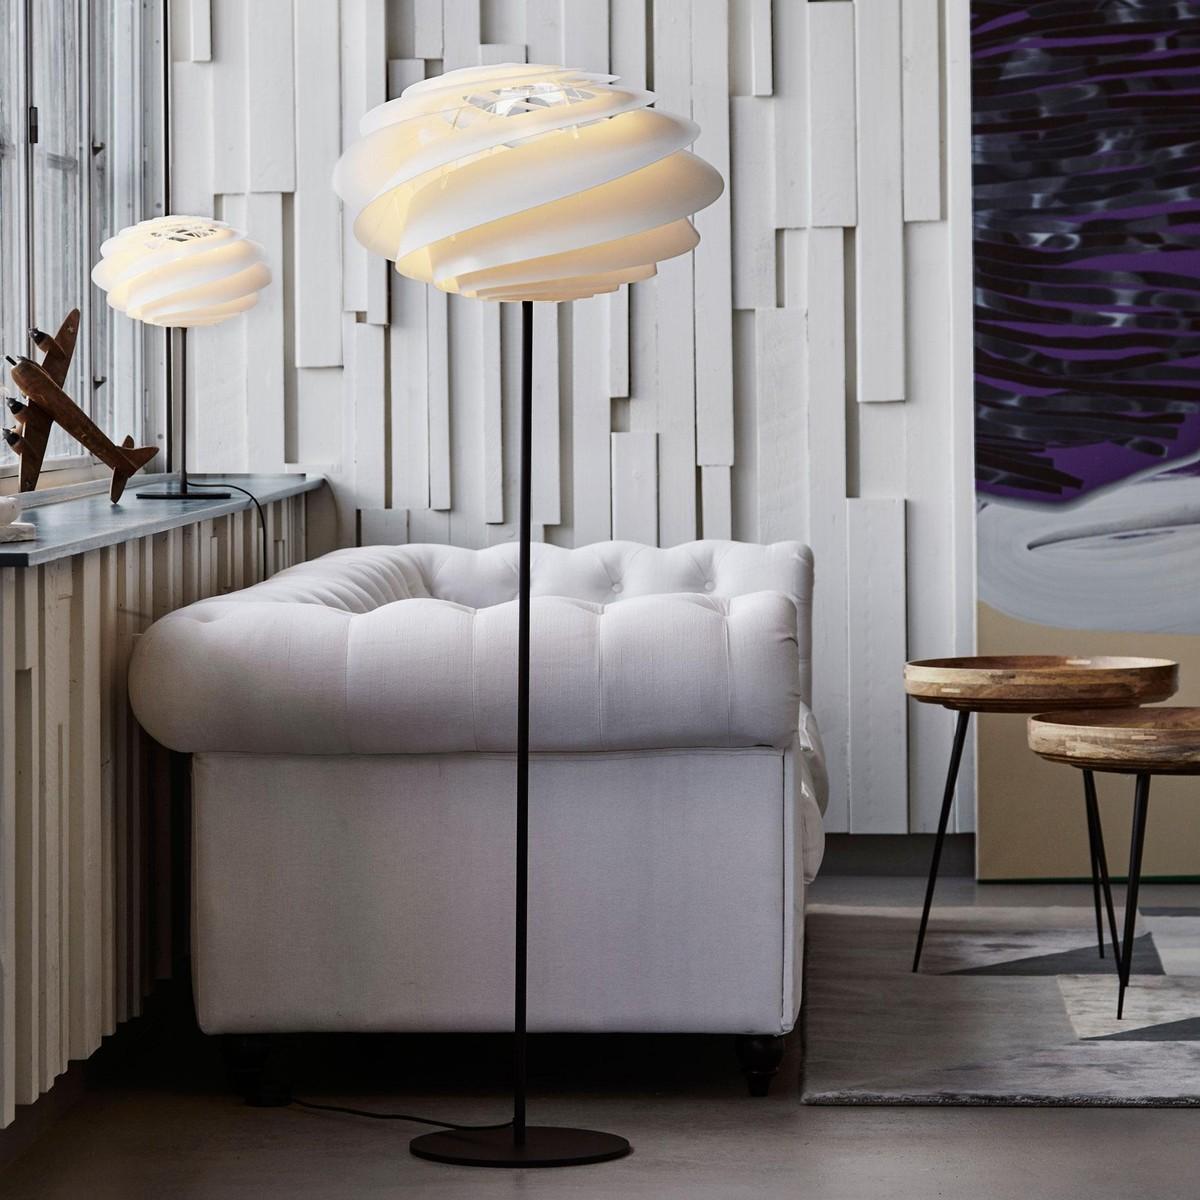 Le Klint Swirl Table Lamp H50cm Le Klint AmbienteDirectcom